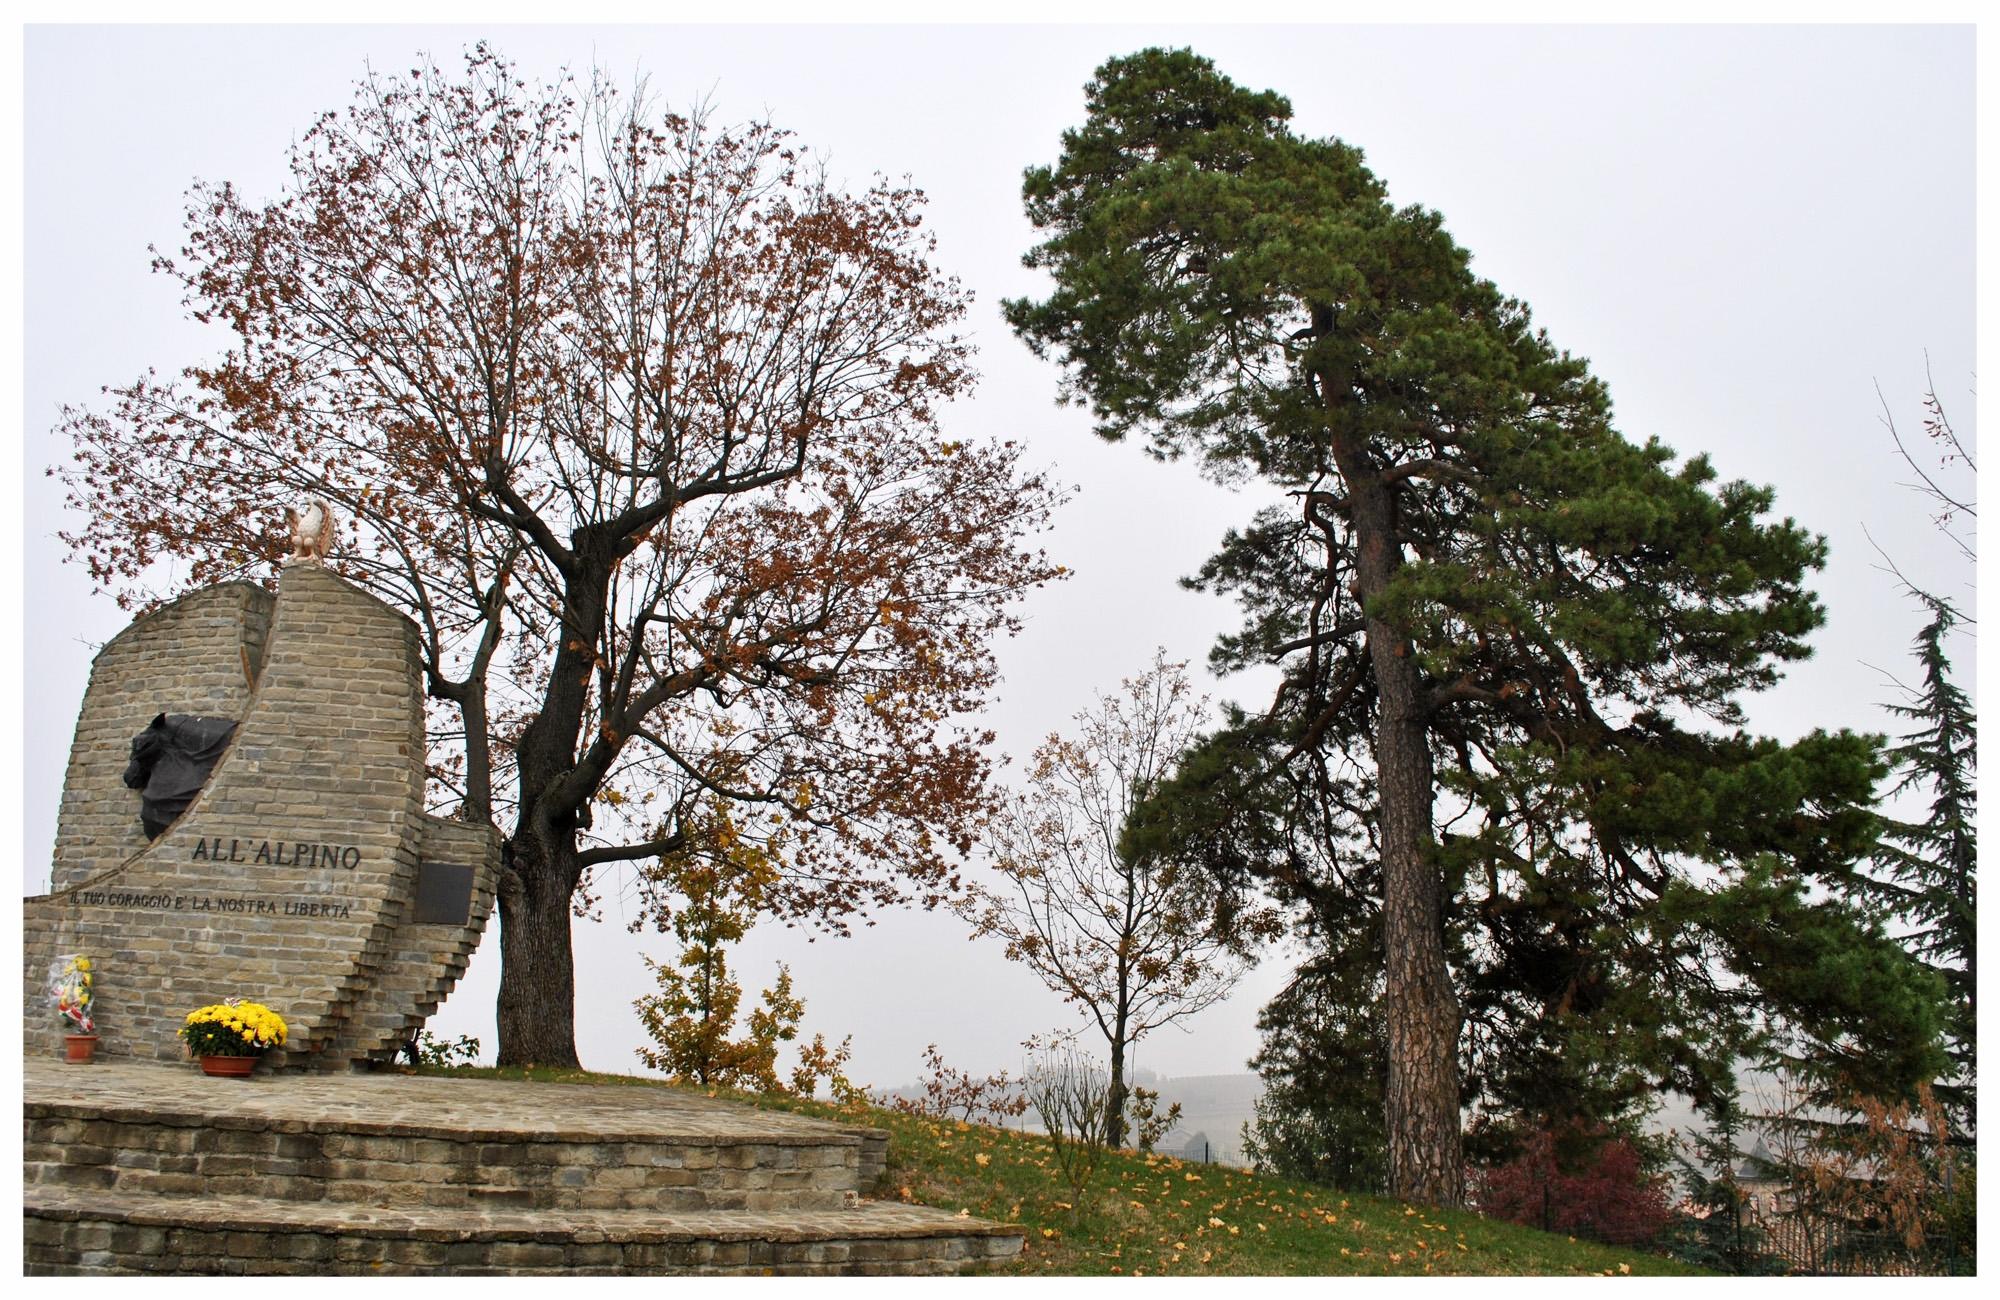 Paesaggio_di_Neviglie COMUNE LANGHE ROERO PIEMONTE TURISMO TOUR ITINERARI VISITA LE LANGHE PINO .jpg